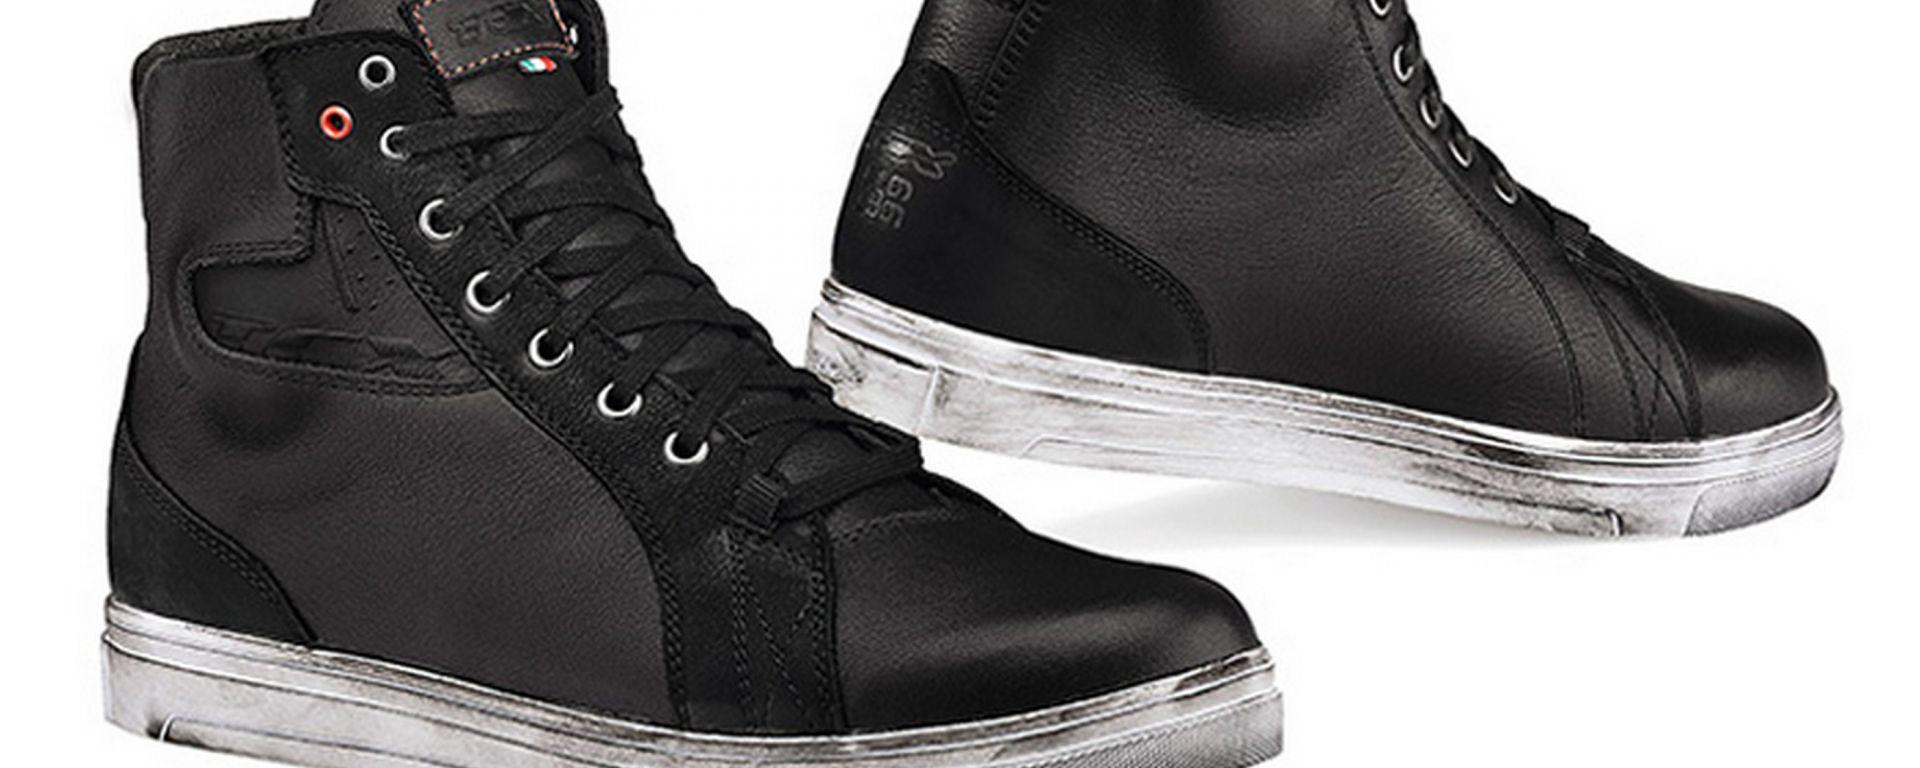 TCX Street Ace: le nuove sneakers stilose e protettive